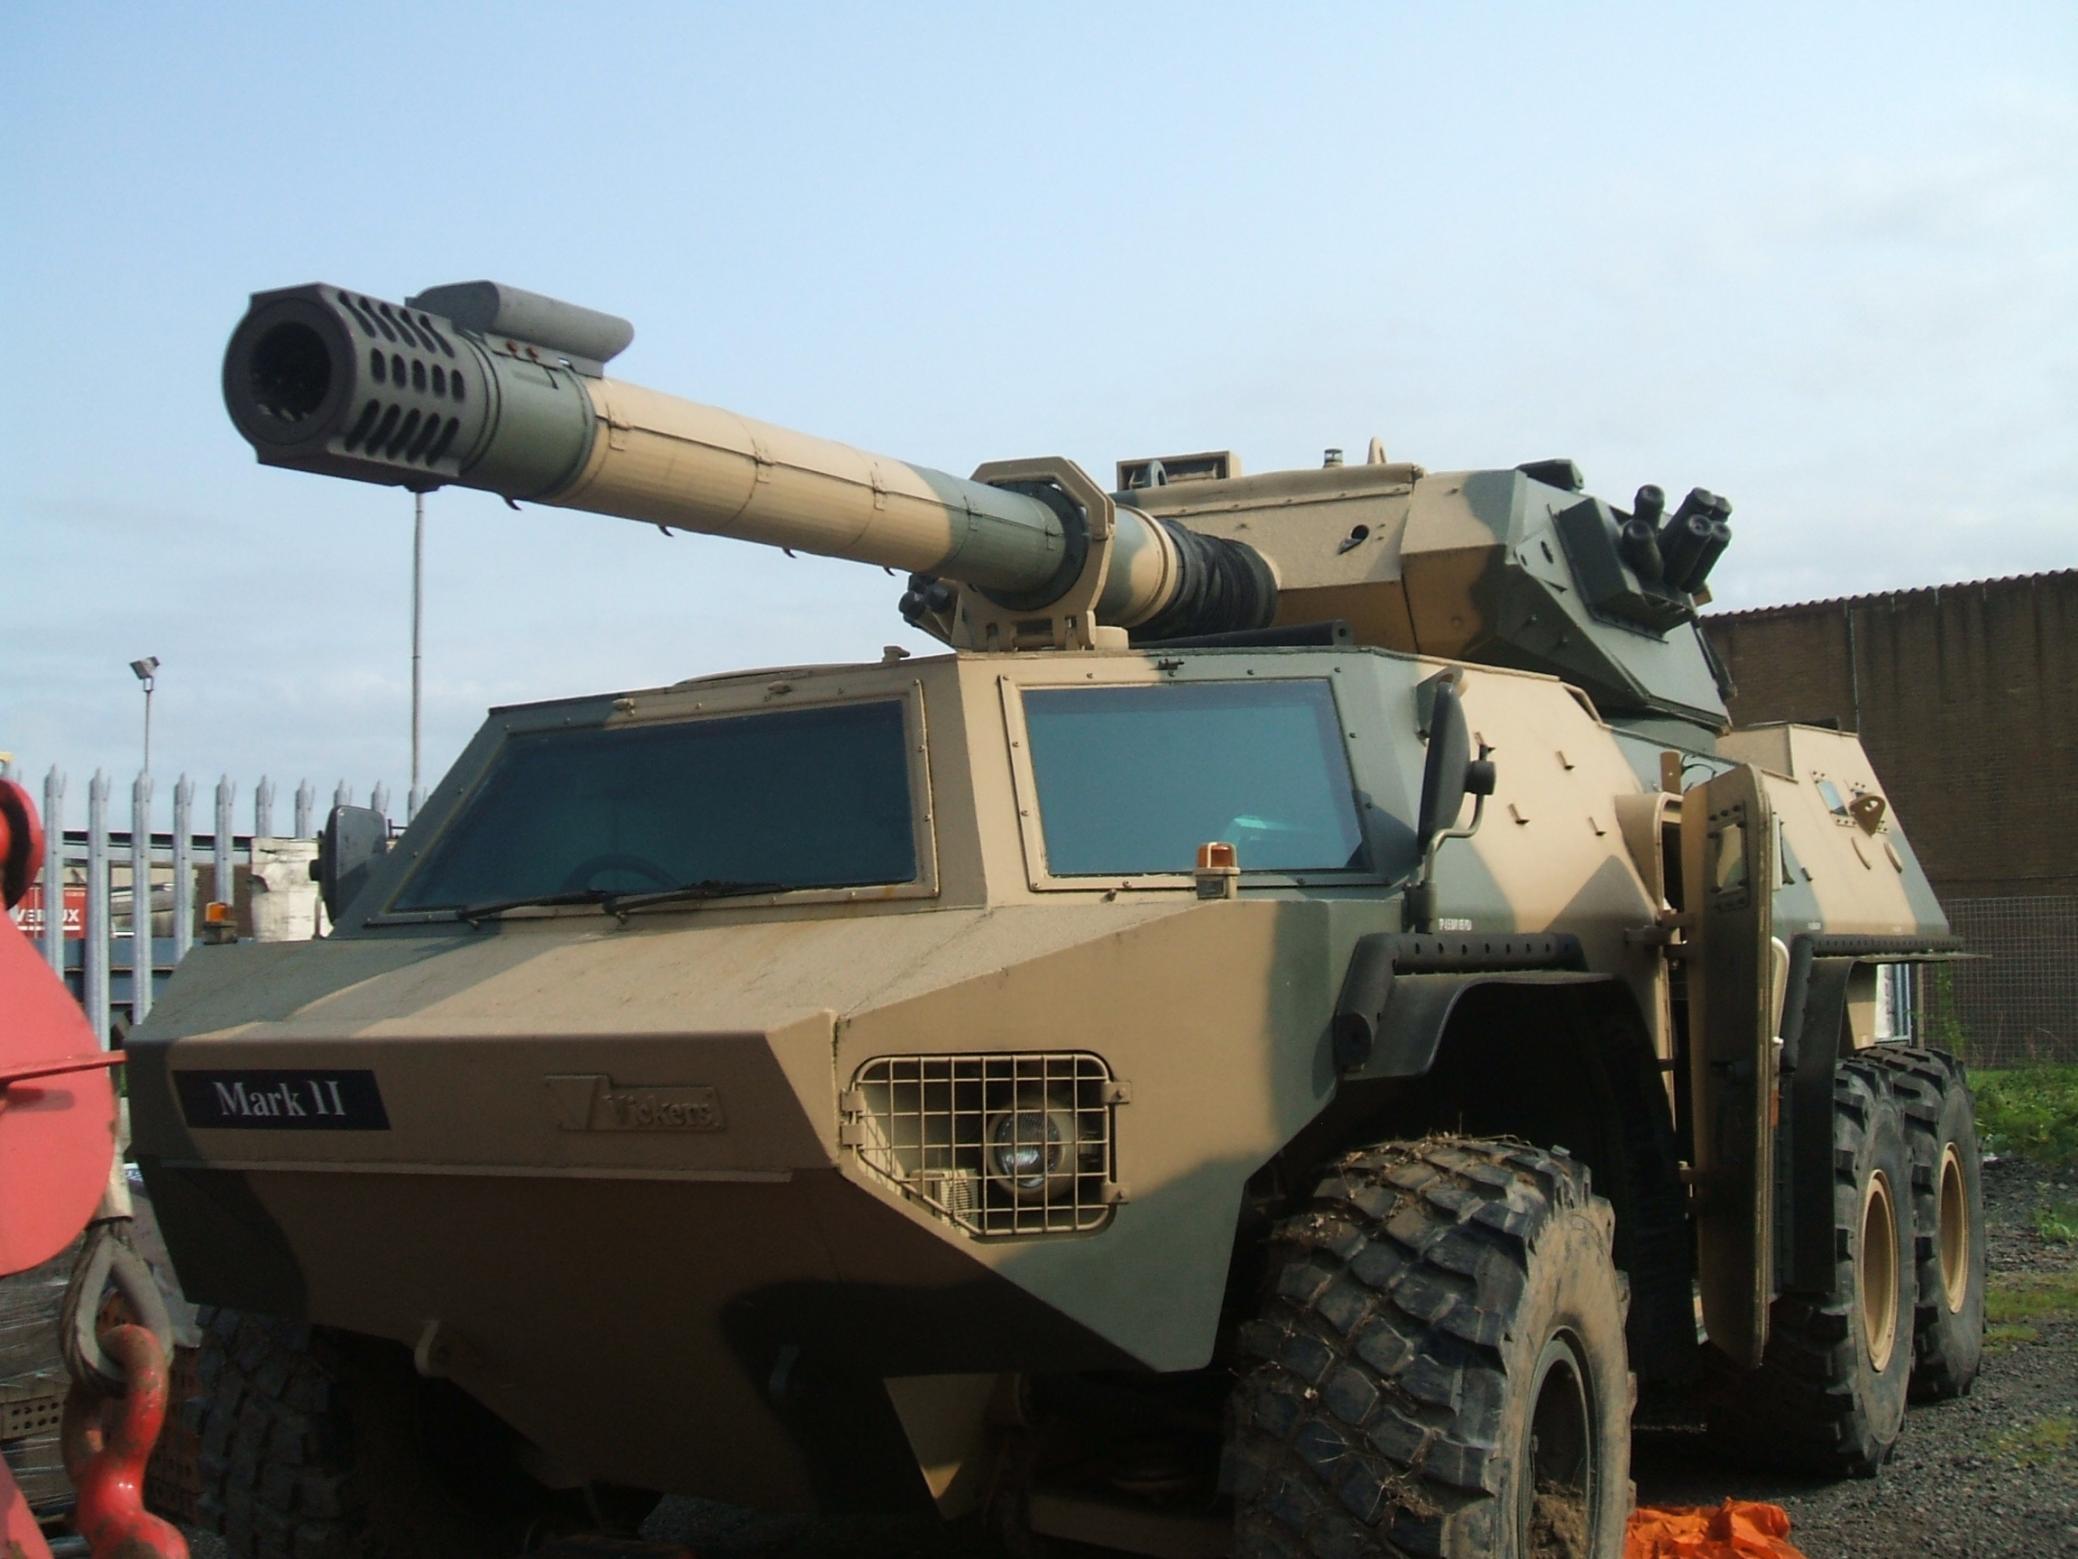 Military Vehicles For Sale Canada >> Vickers MK11 ( Viper ) Boader Patrol Vehicle, - Blogs of MV restorations - HMVF - Historic ...